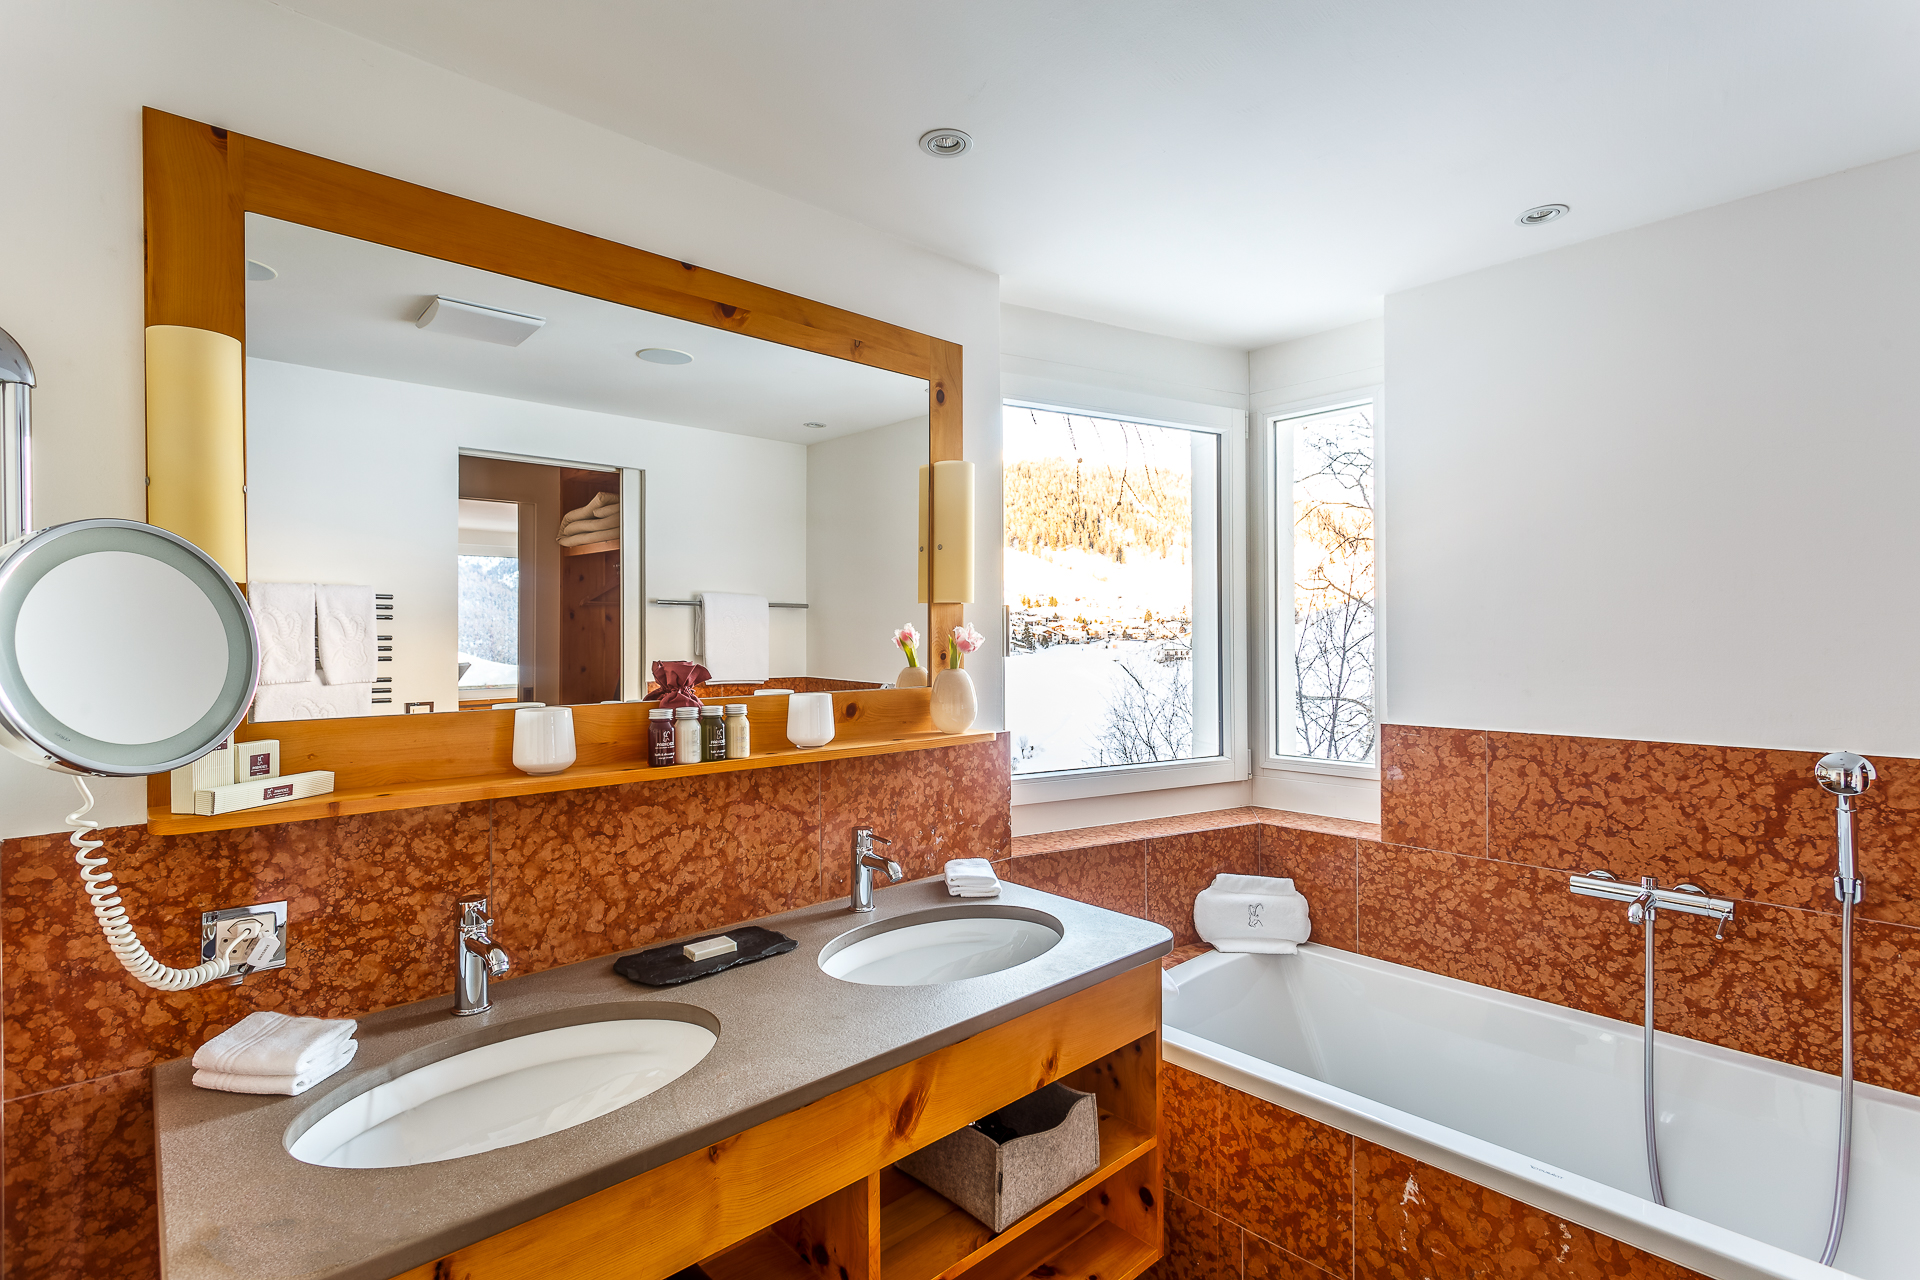 Badezimmer-Suite-Hotel-Paradies